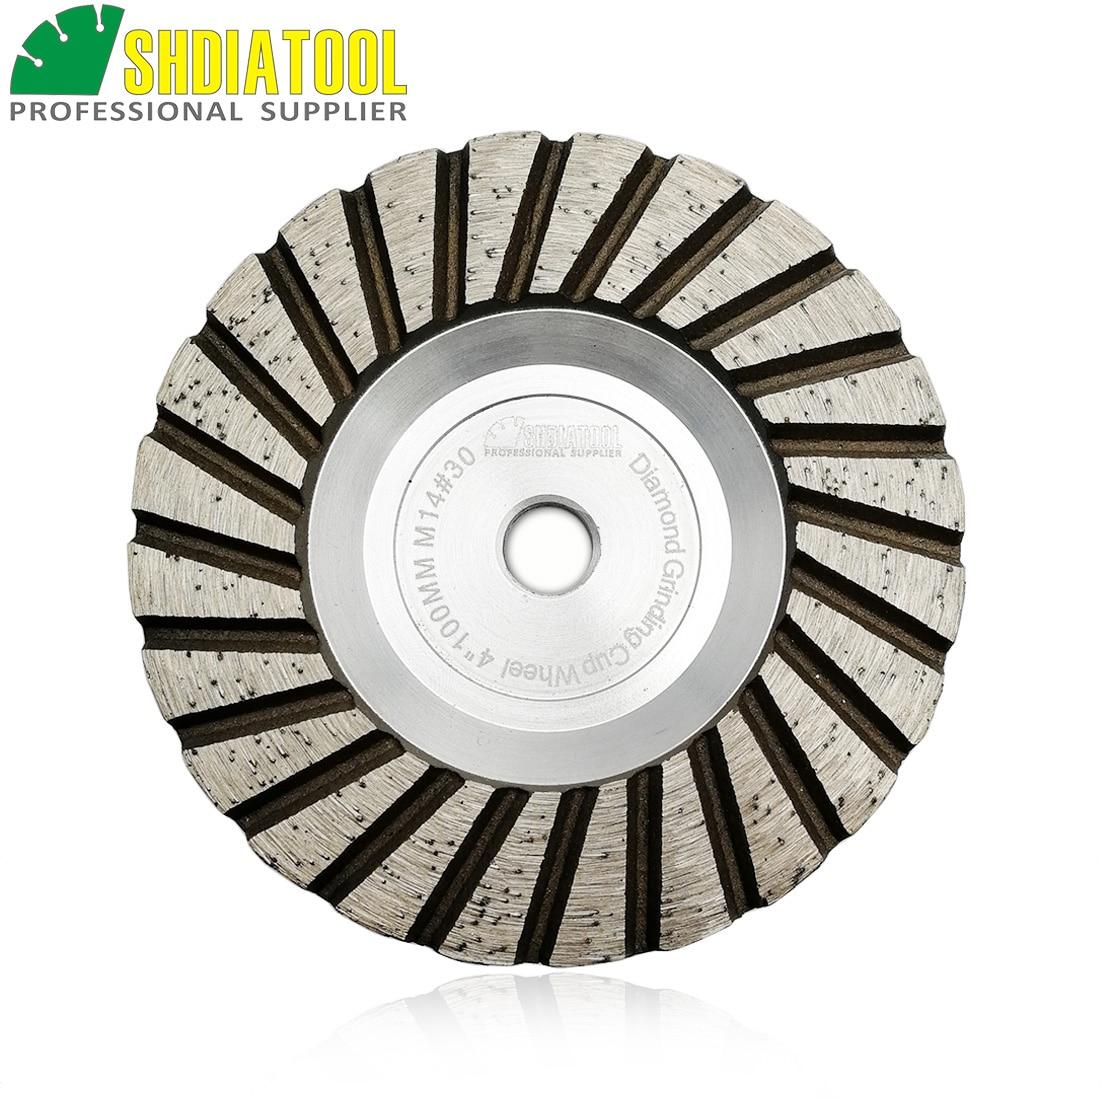 "Shdiatool 1pc m14 diâmetro 4 ""/100mm diamante moagem copo roda de alumínio baseado disco moagem granito mármore"